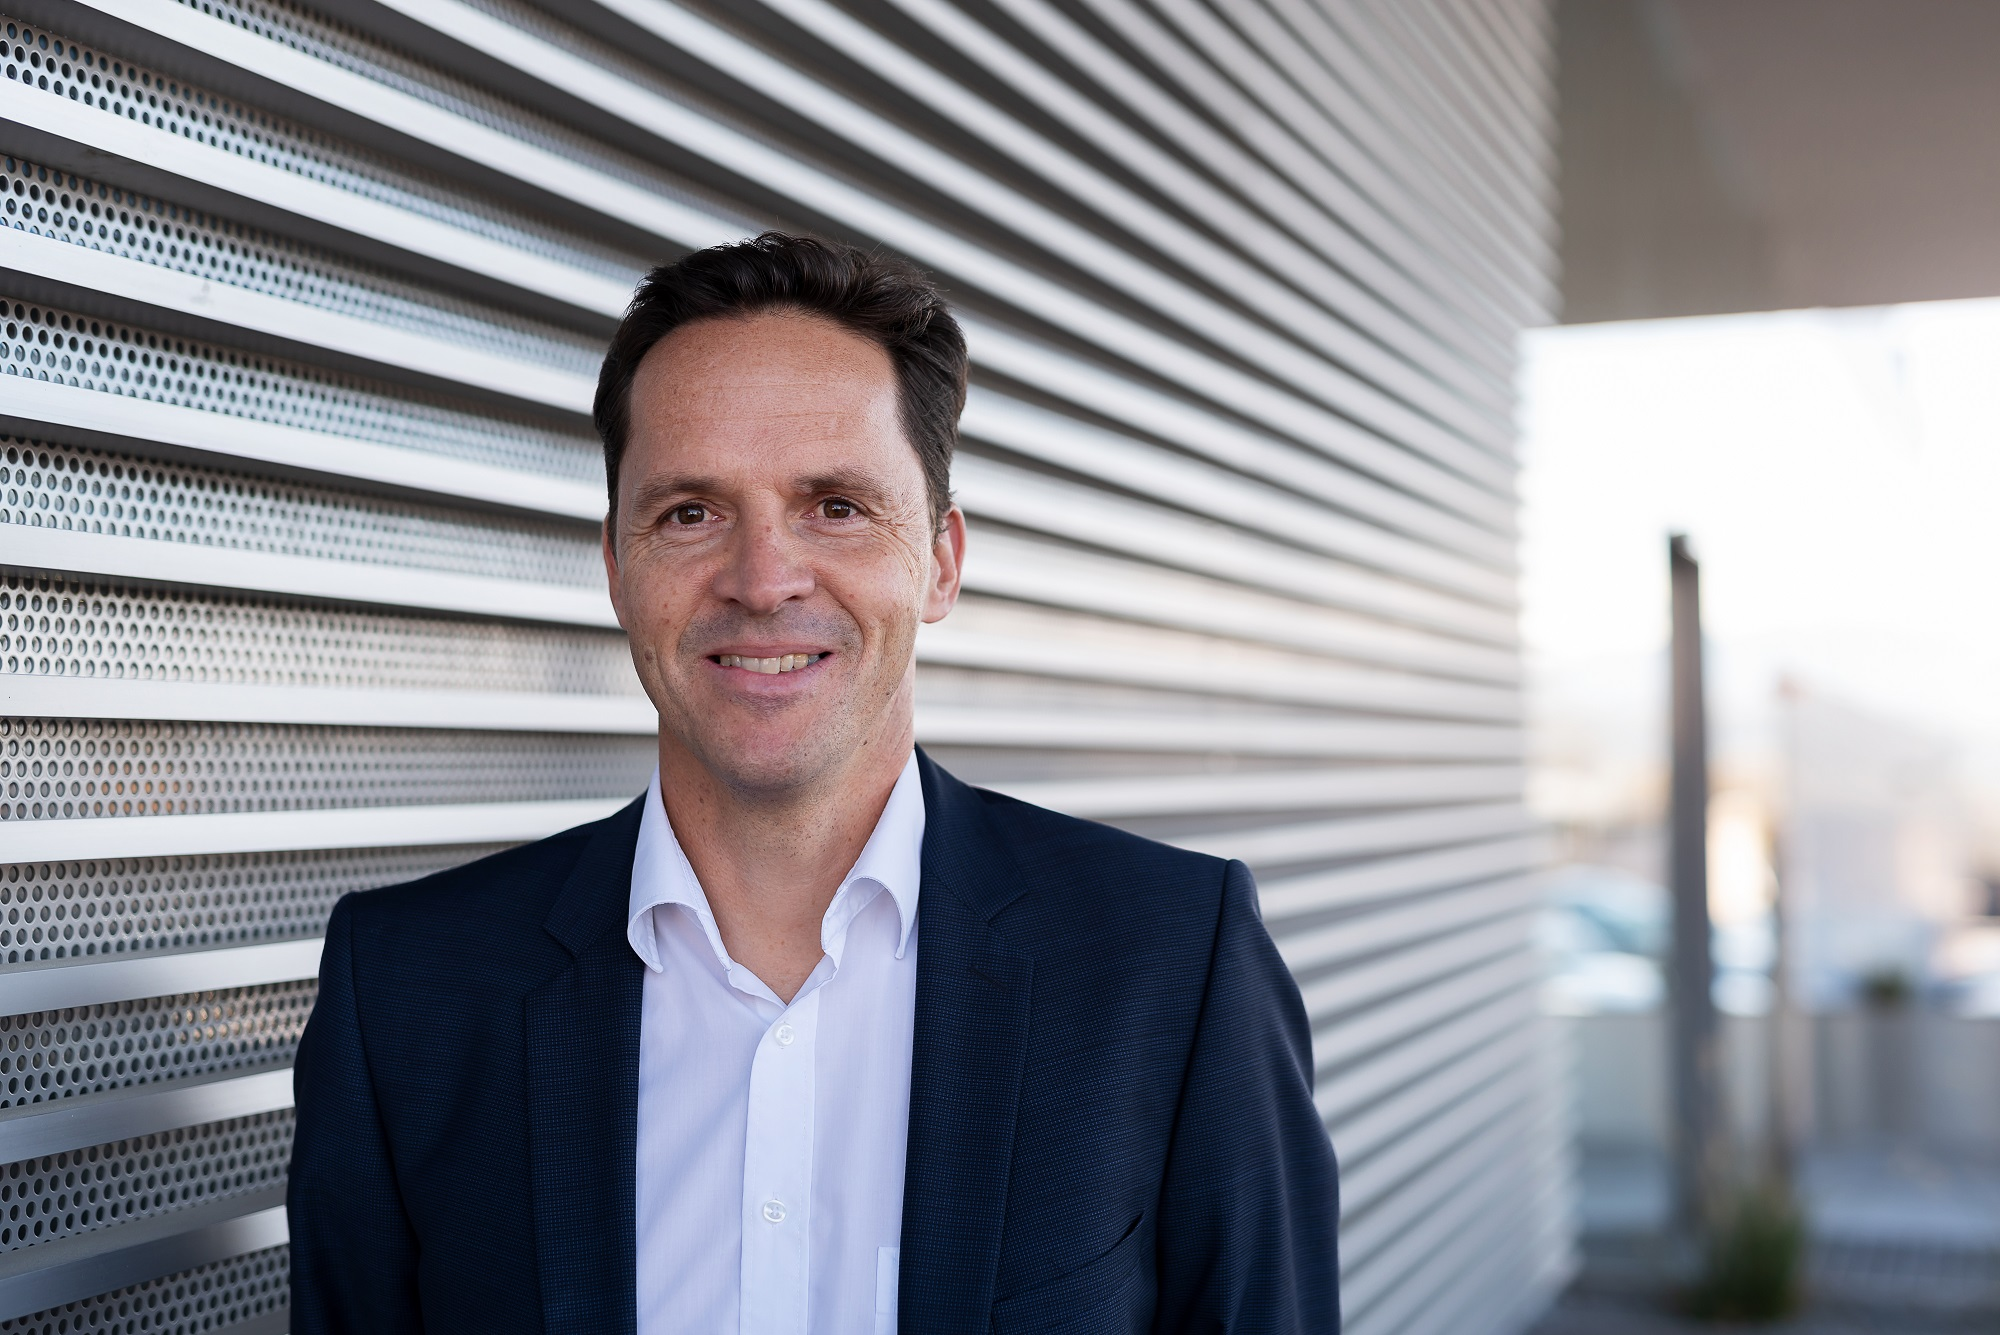 Manfred Unterbrunner, Geschäftsführung